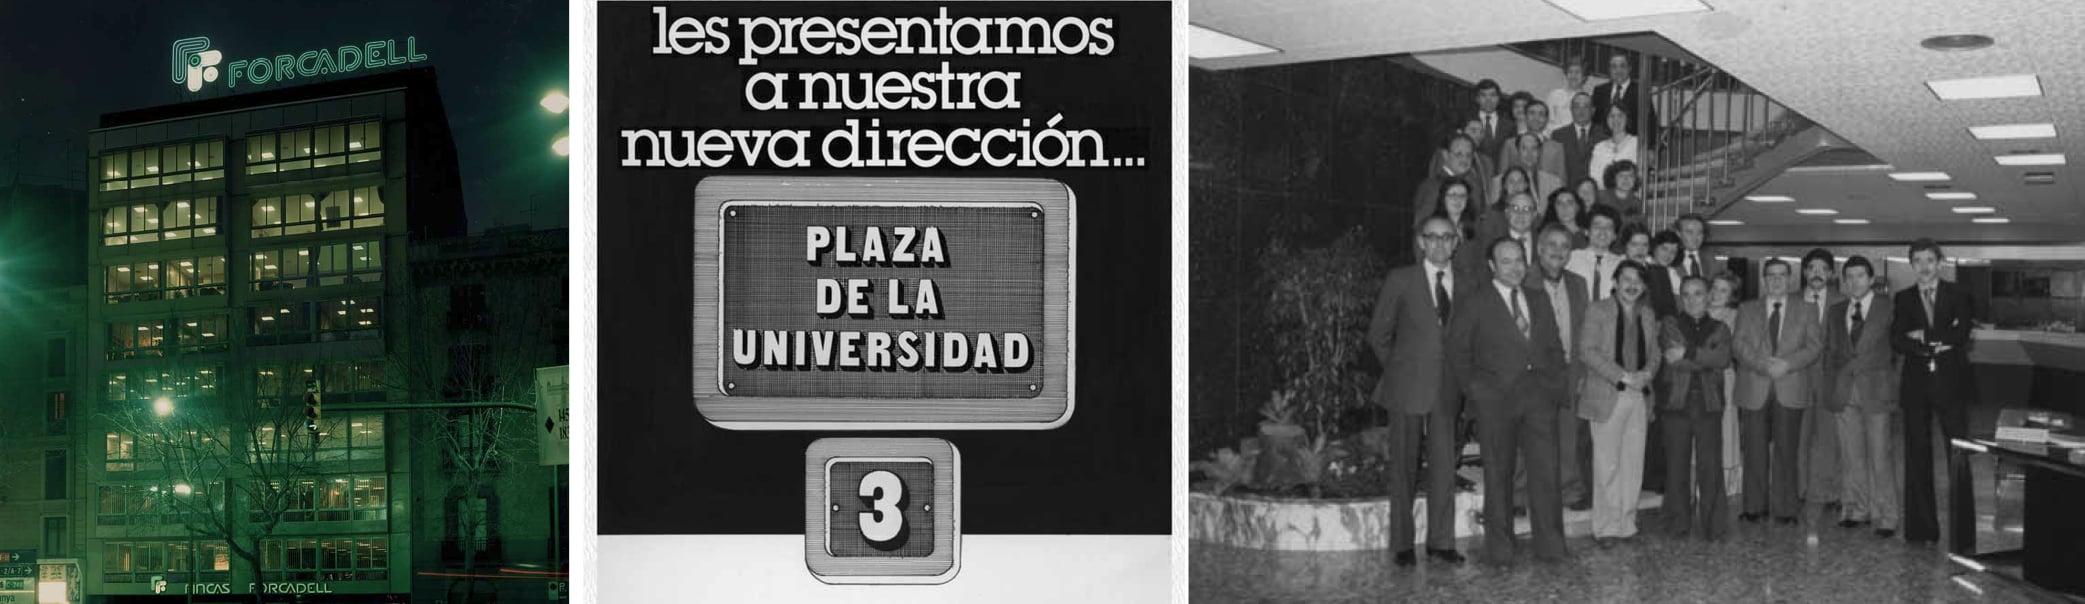 Historia de la consultora inmobiliaria forcadell forcadell - Inmobiliaria origen ...